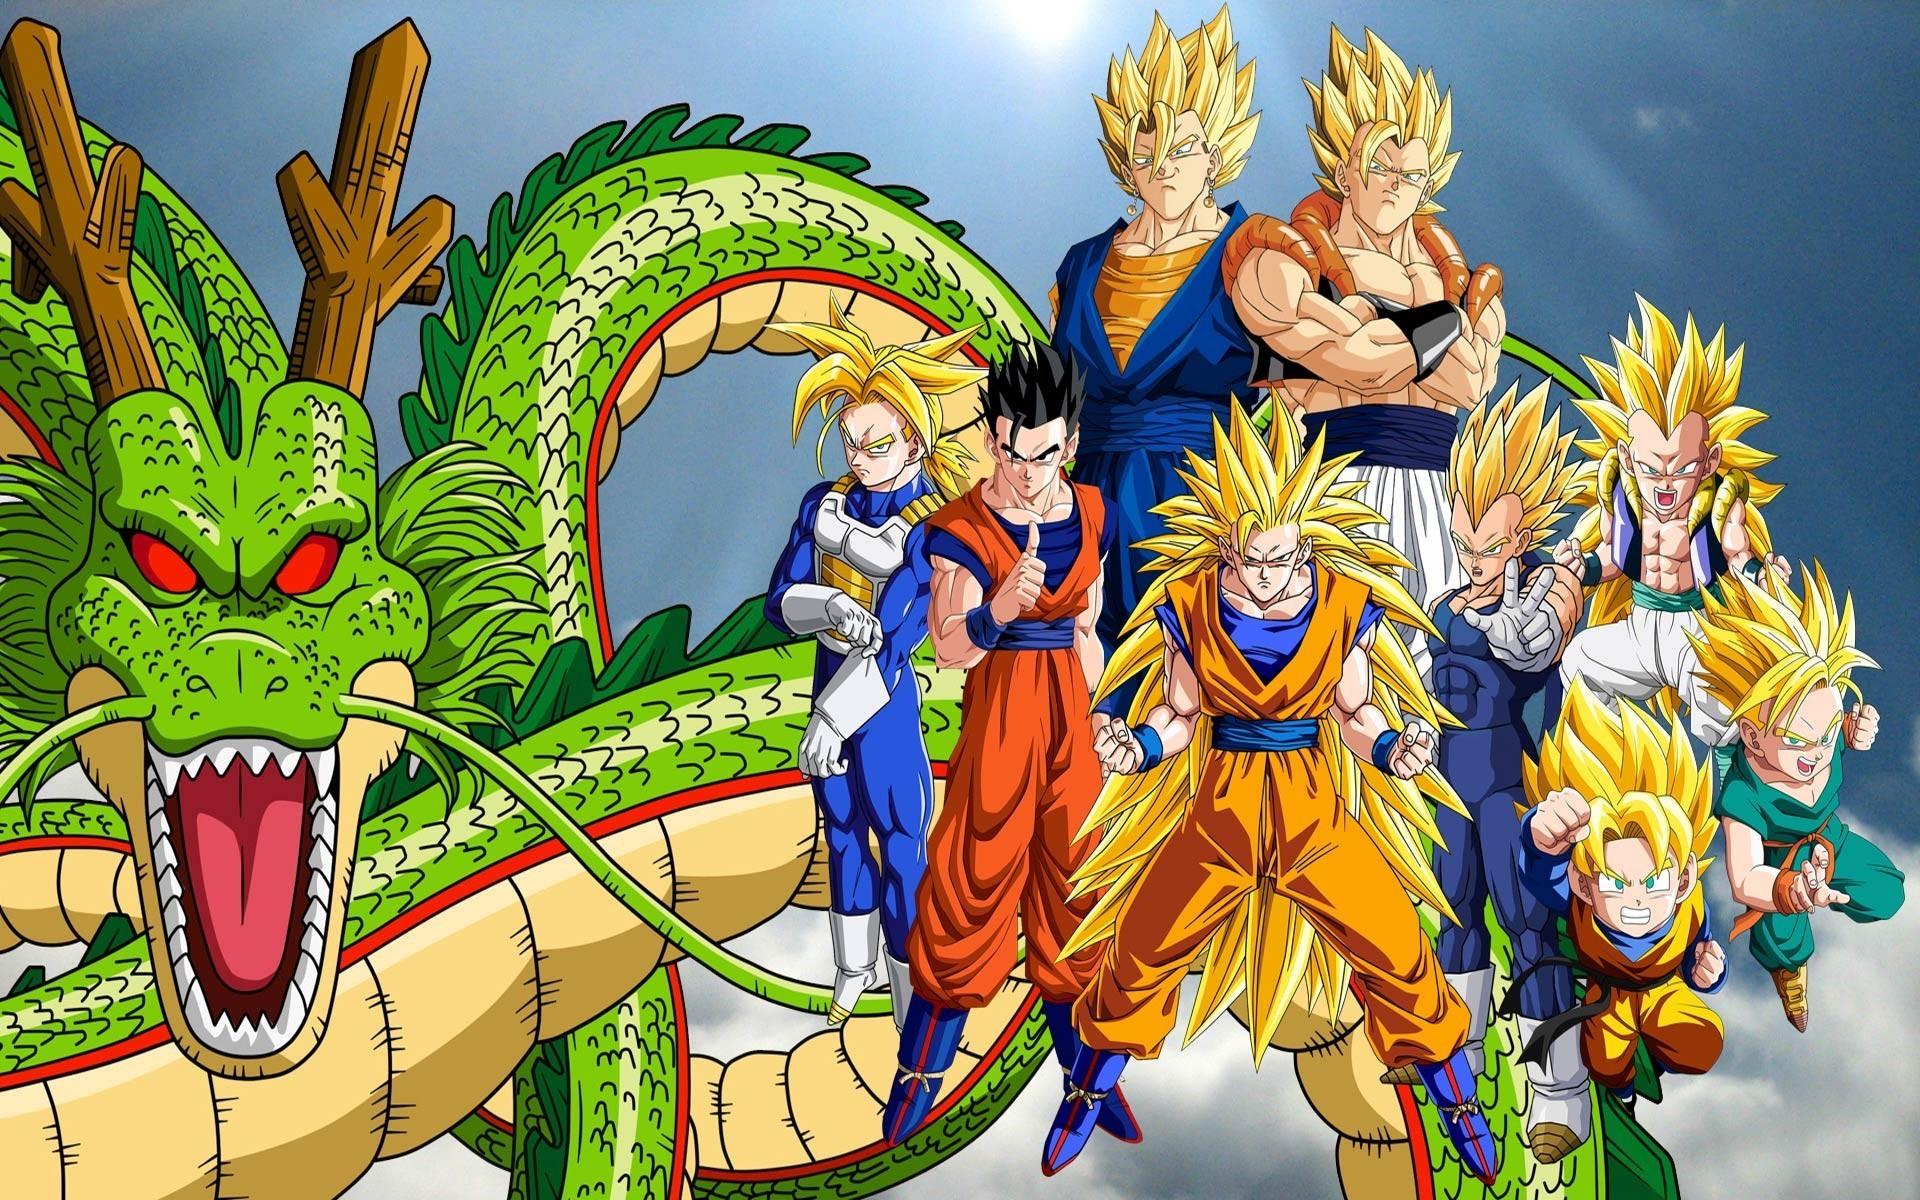 Dragon Ball, Super Saiyan, Trunks (character), Vegeta, Shenron, Gogeta